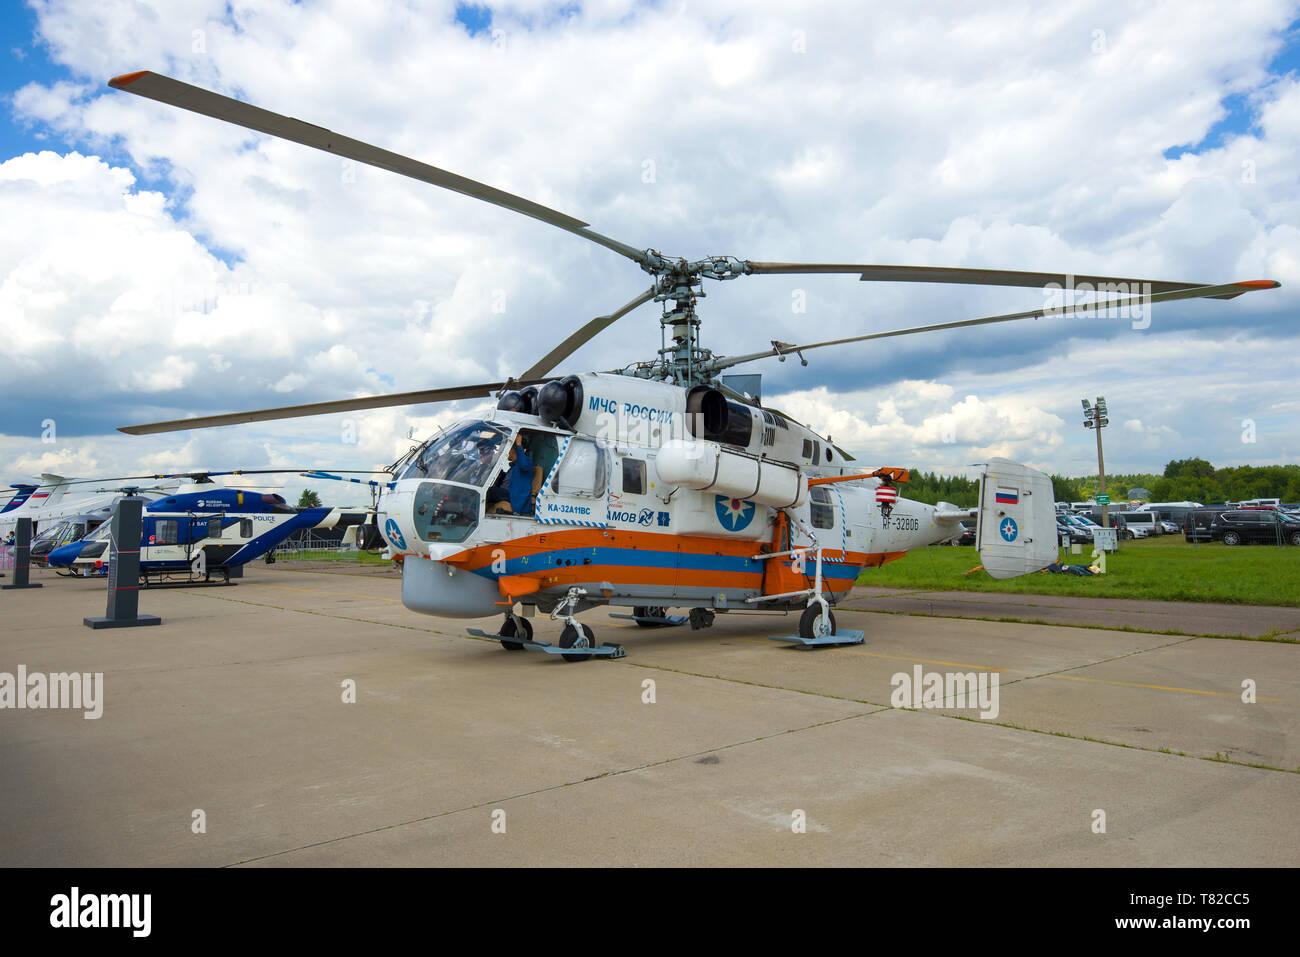 ZHUKOVSKY, RUSSIA - JULY 20, 2017: Helicopter Kamov Ka-32A11BK (RF-32806) EMERCOM of Russia at MAKS-2017 air show - Stock Image